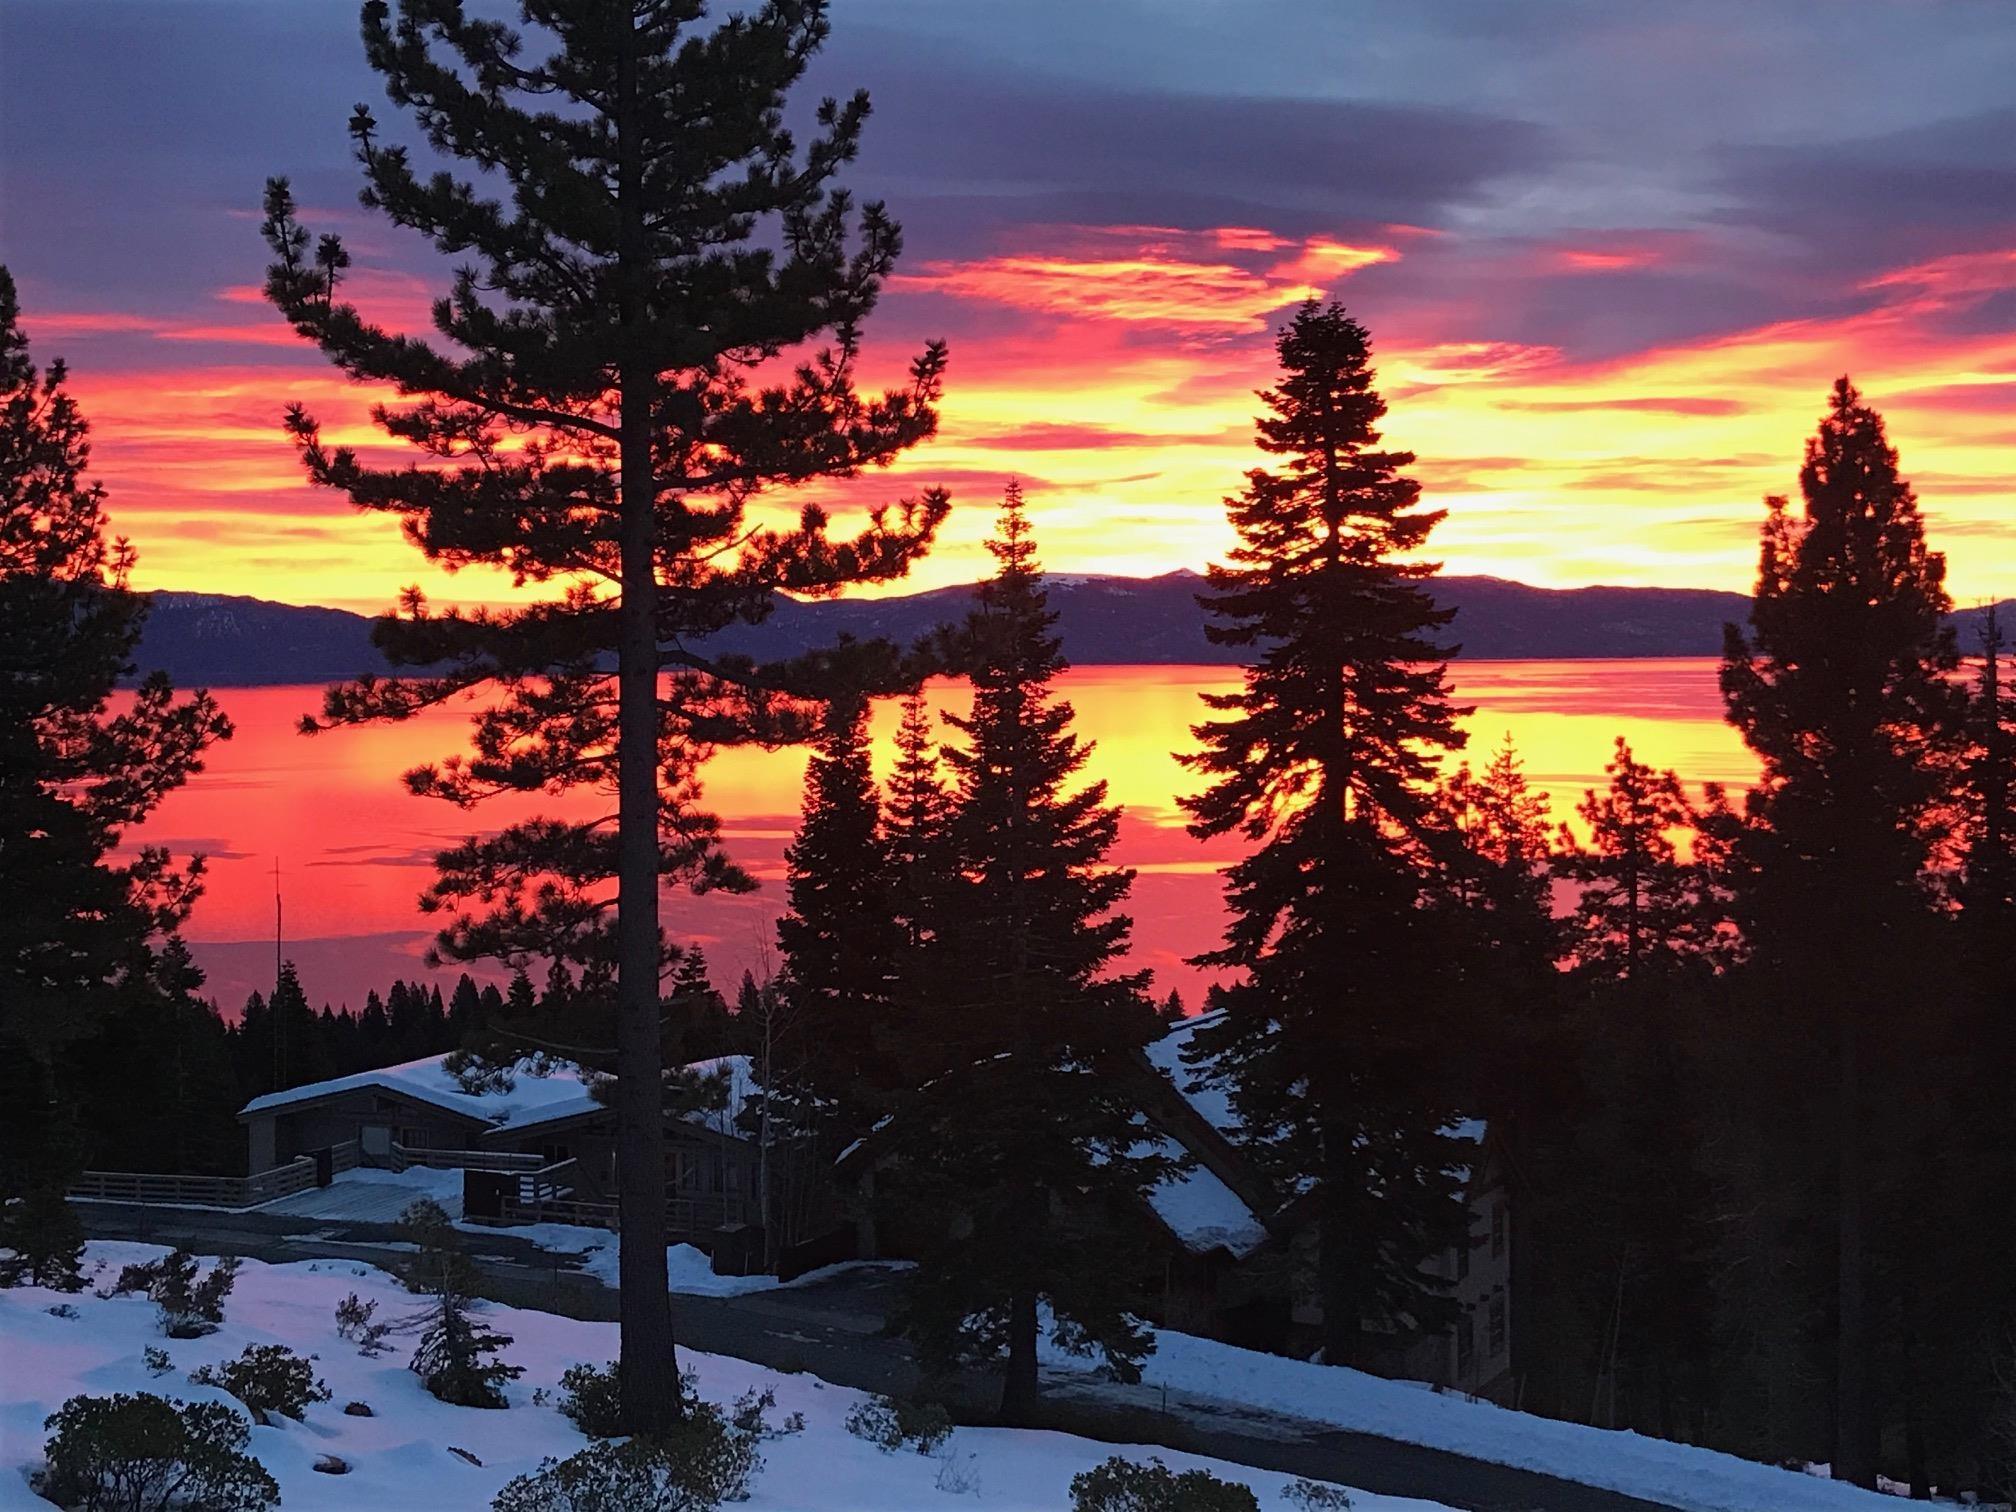 Big Pine Lakeview.jpg